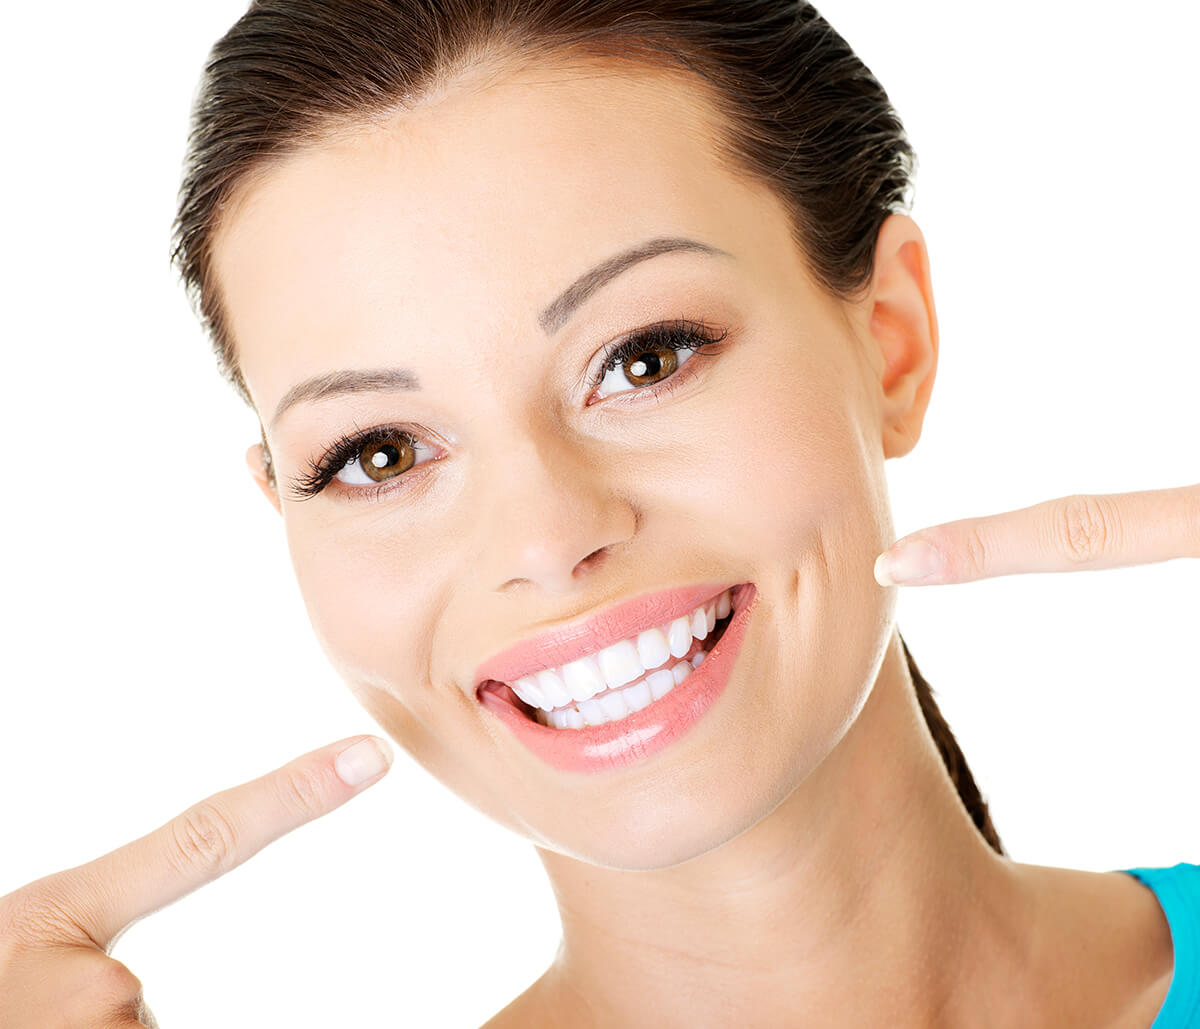 Dental Rehabilitation Procedure at Stephen J Matarazzo DMD office Quincy Area